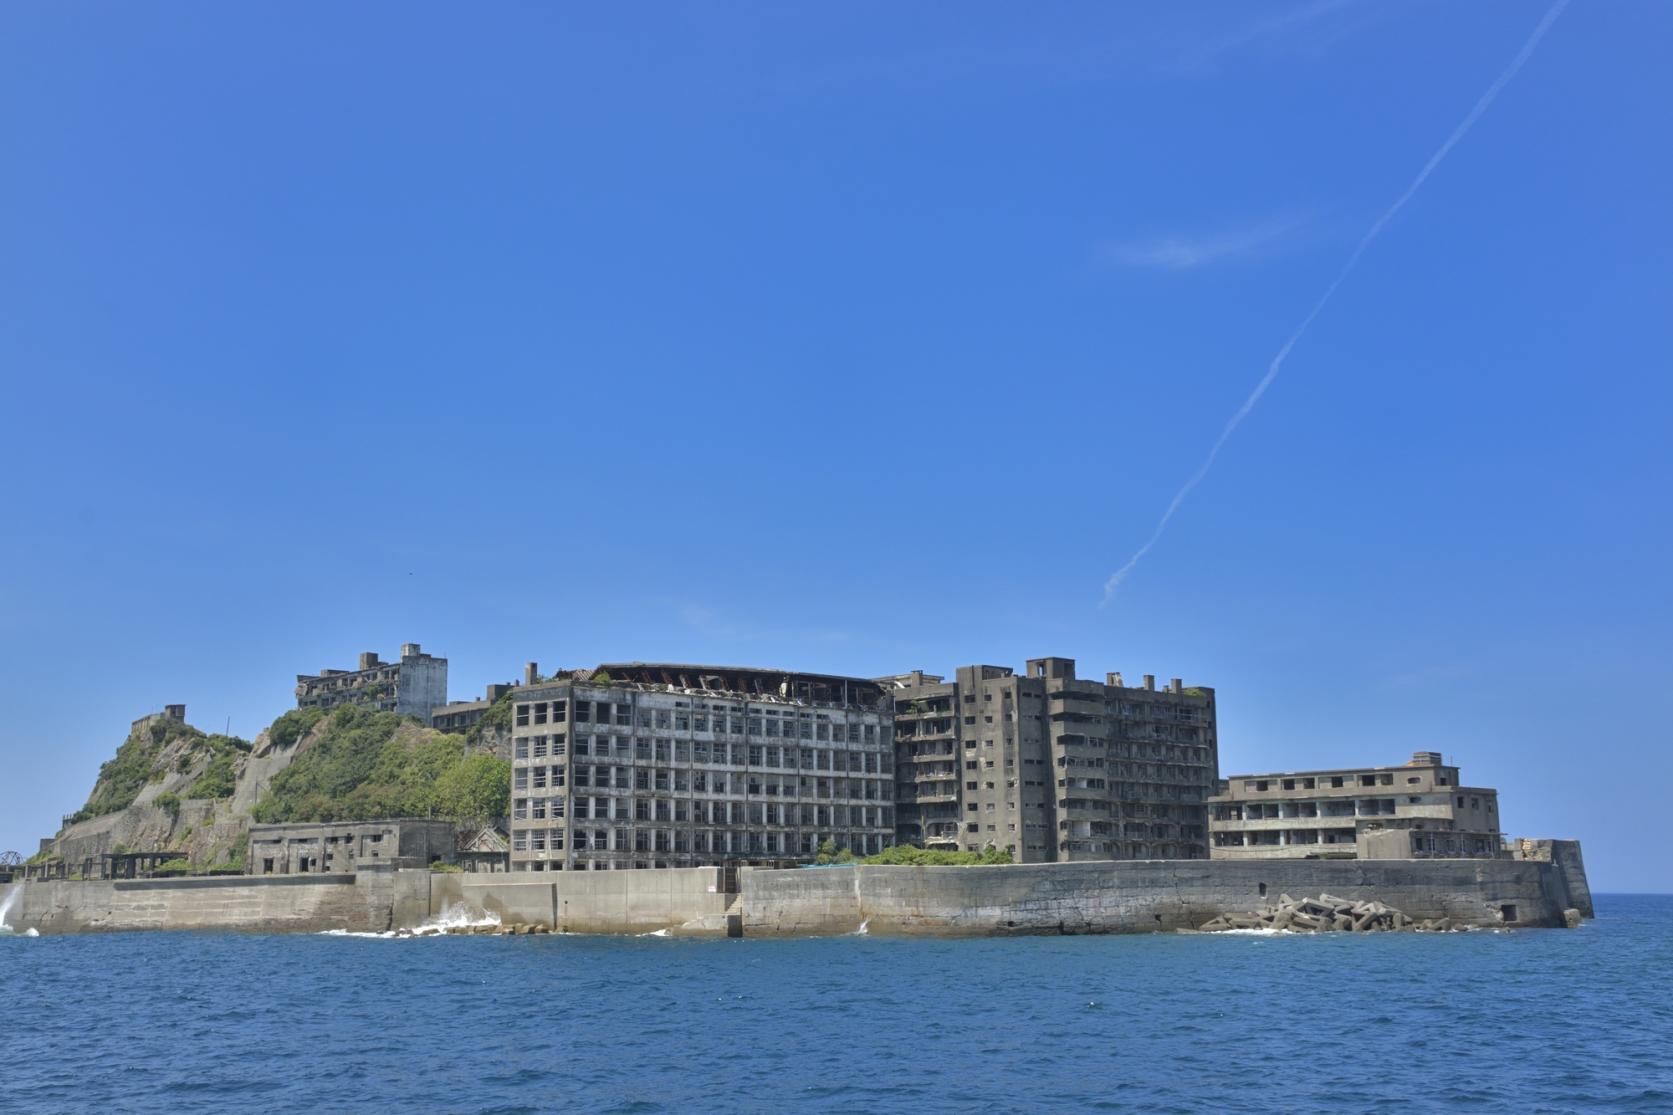 Gunkanjima (Hashima, Battleship Island) Landing & Cruising Tour-3